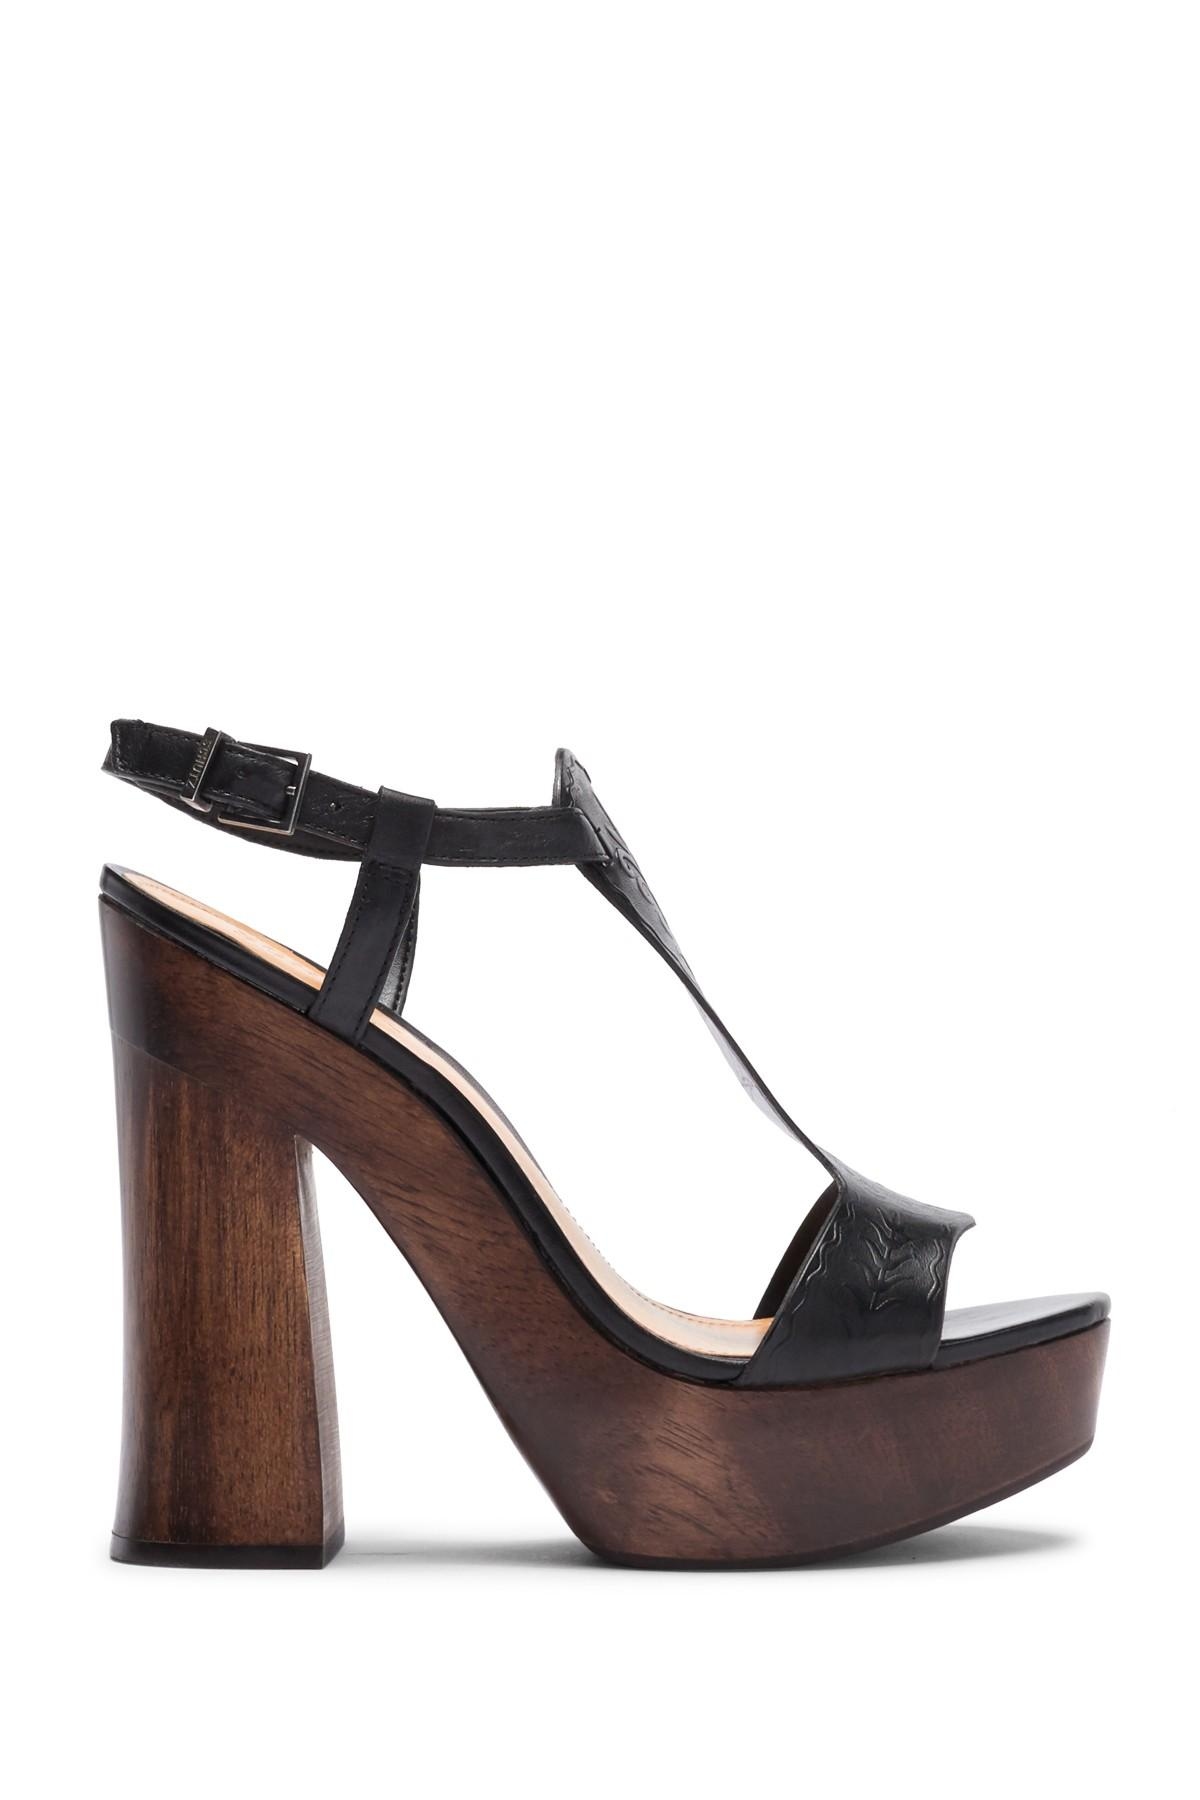 528fd49386a3 Schutz - Black Michele T-strap Platform Sandal - Lyst. View fullscreen